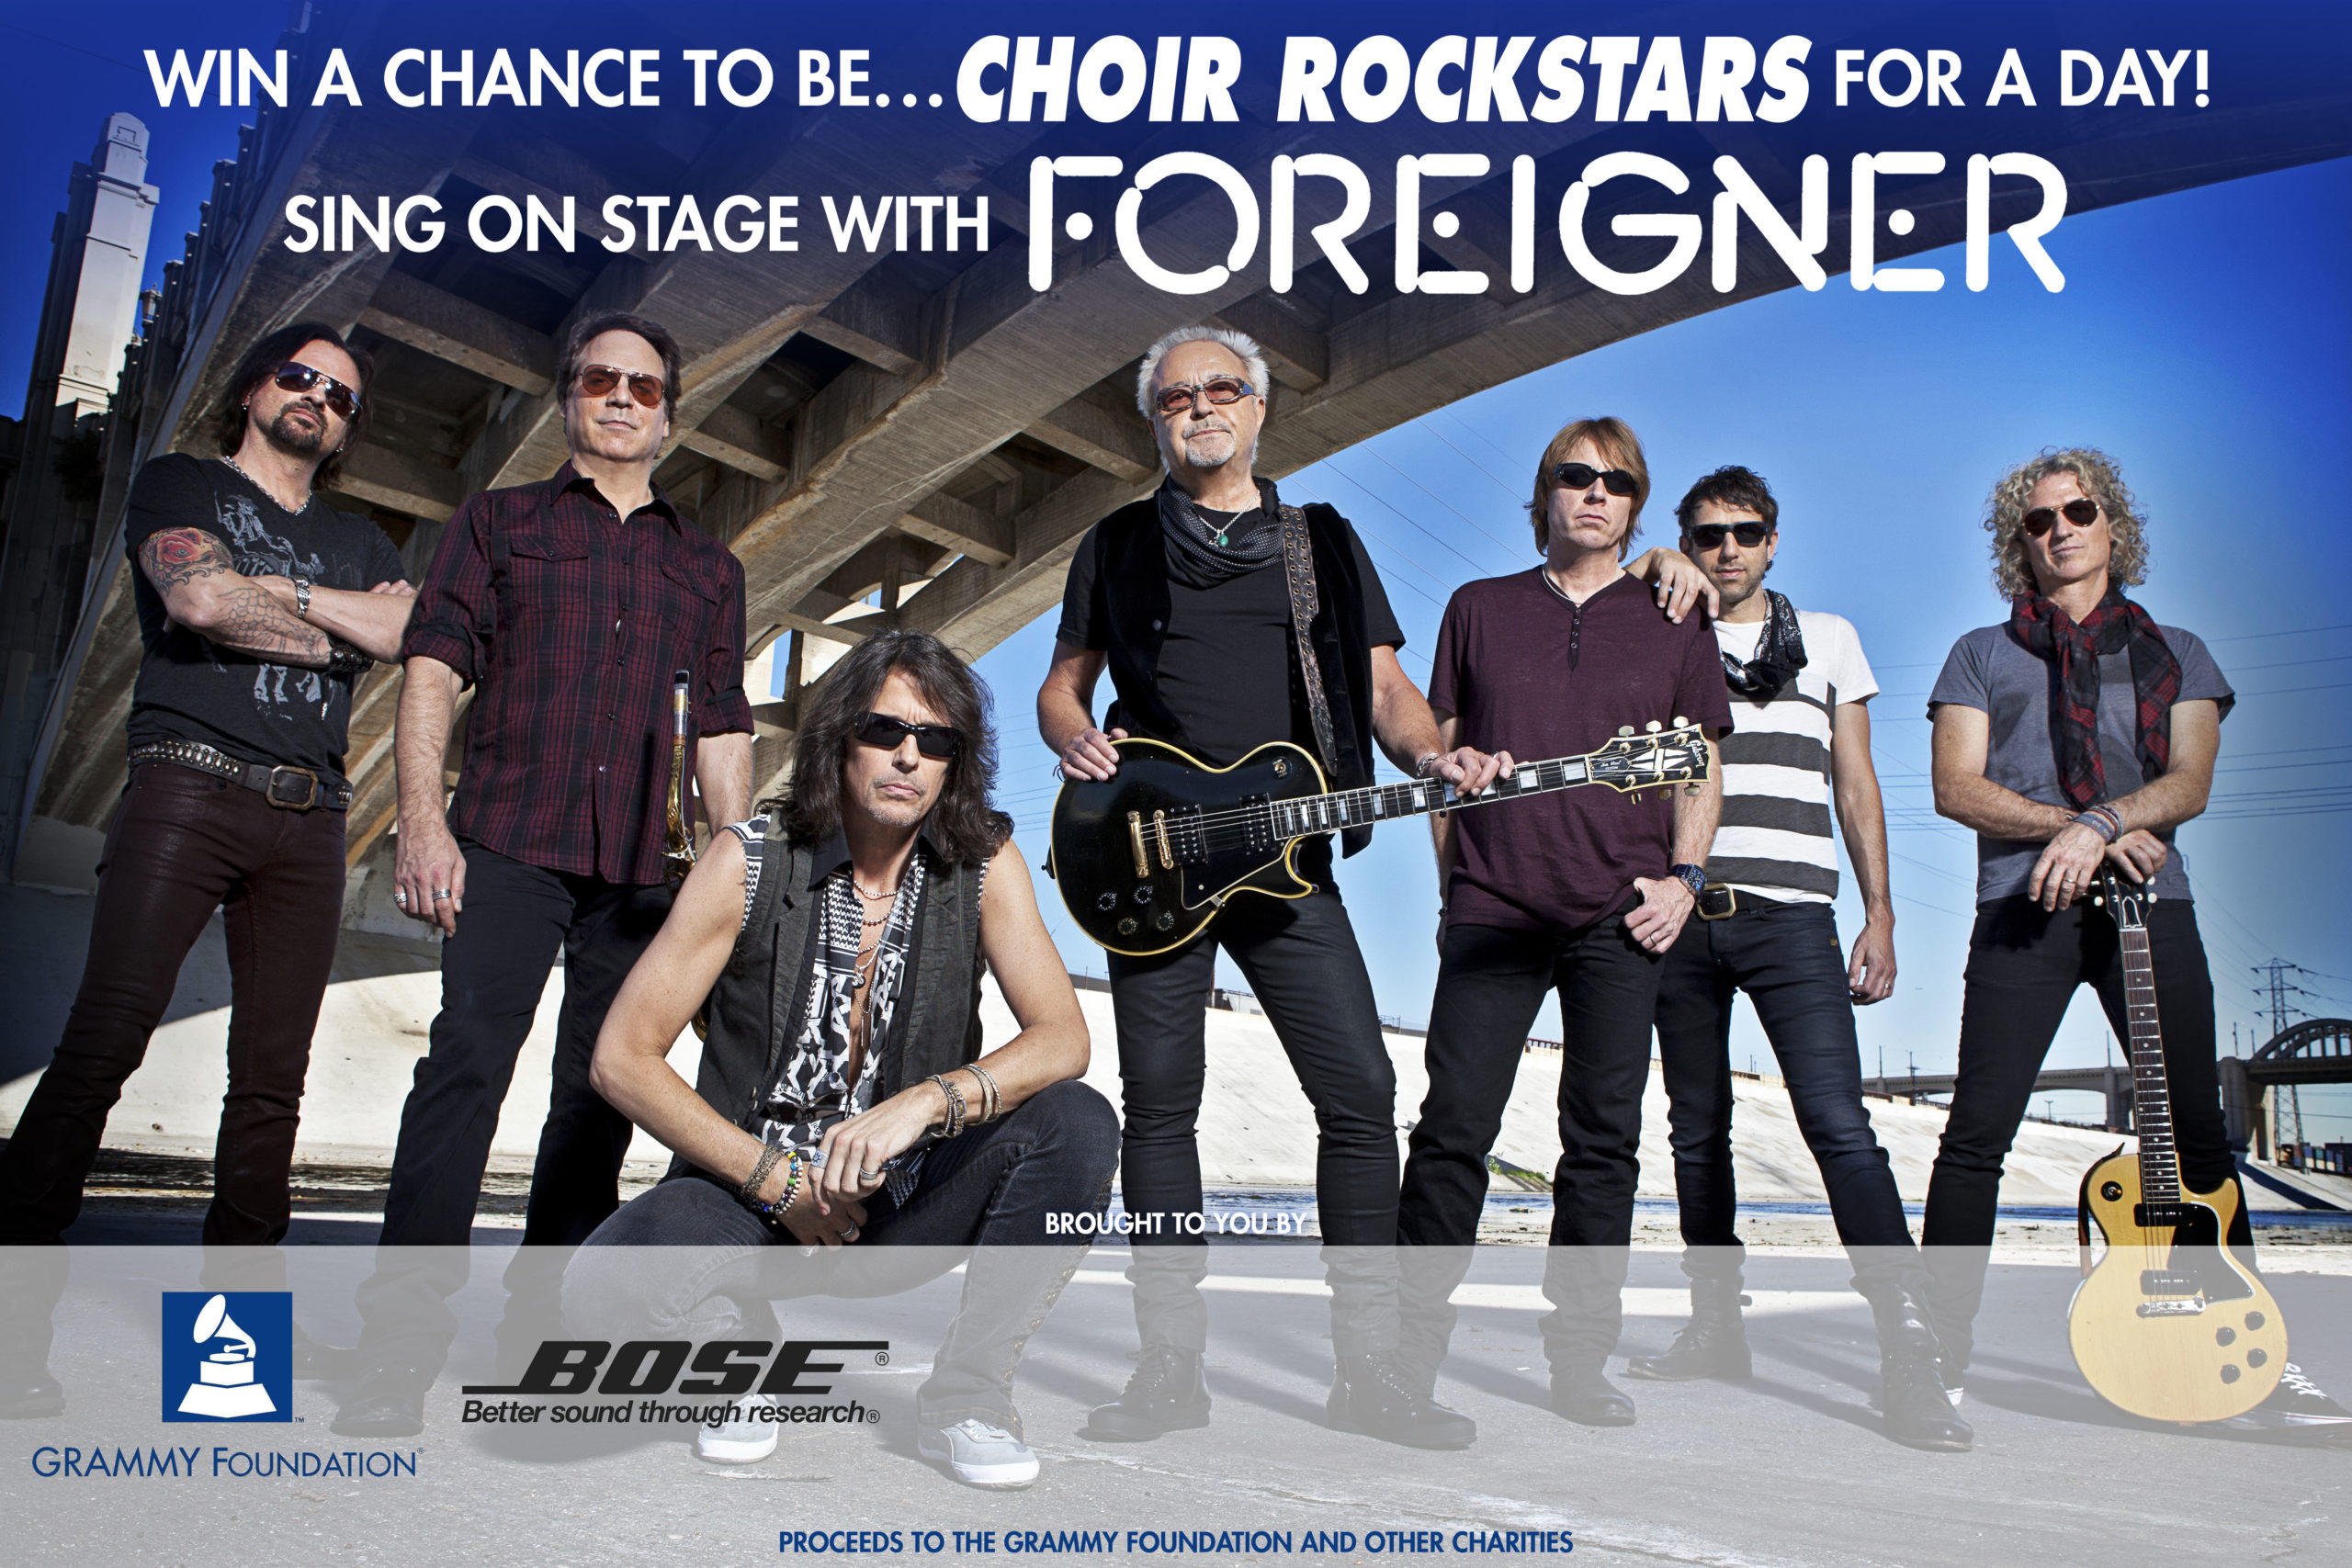 Foreigner Choir Rockstars